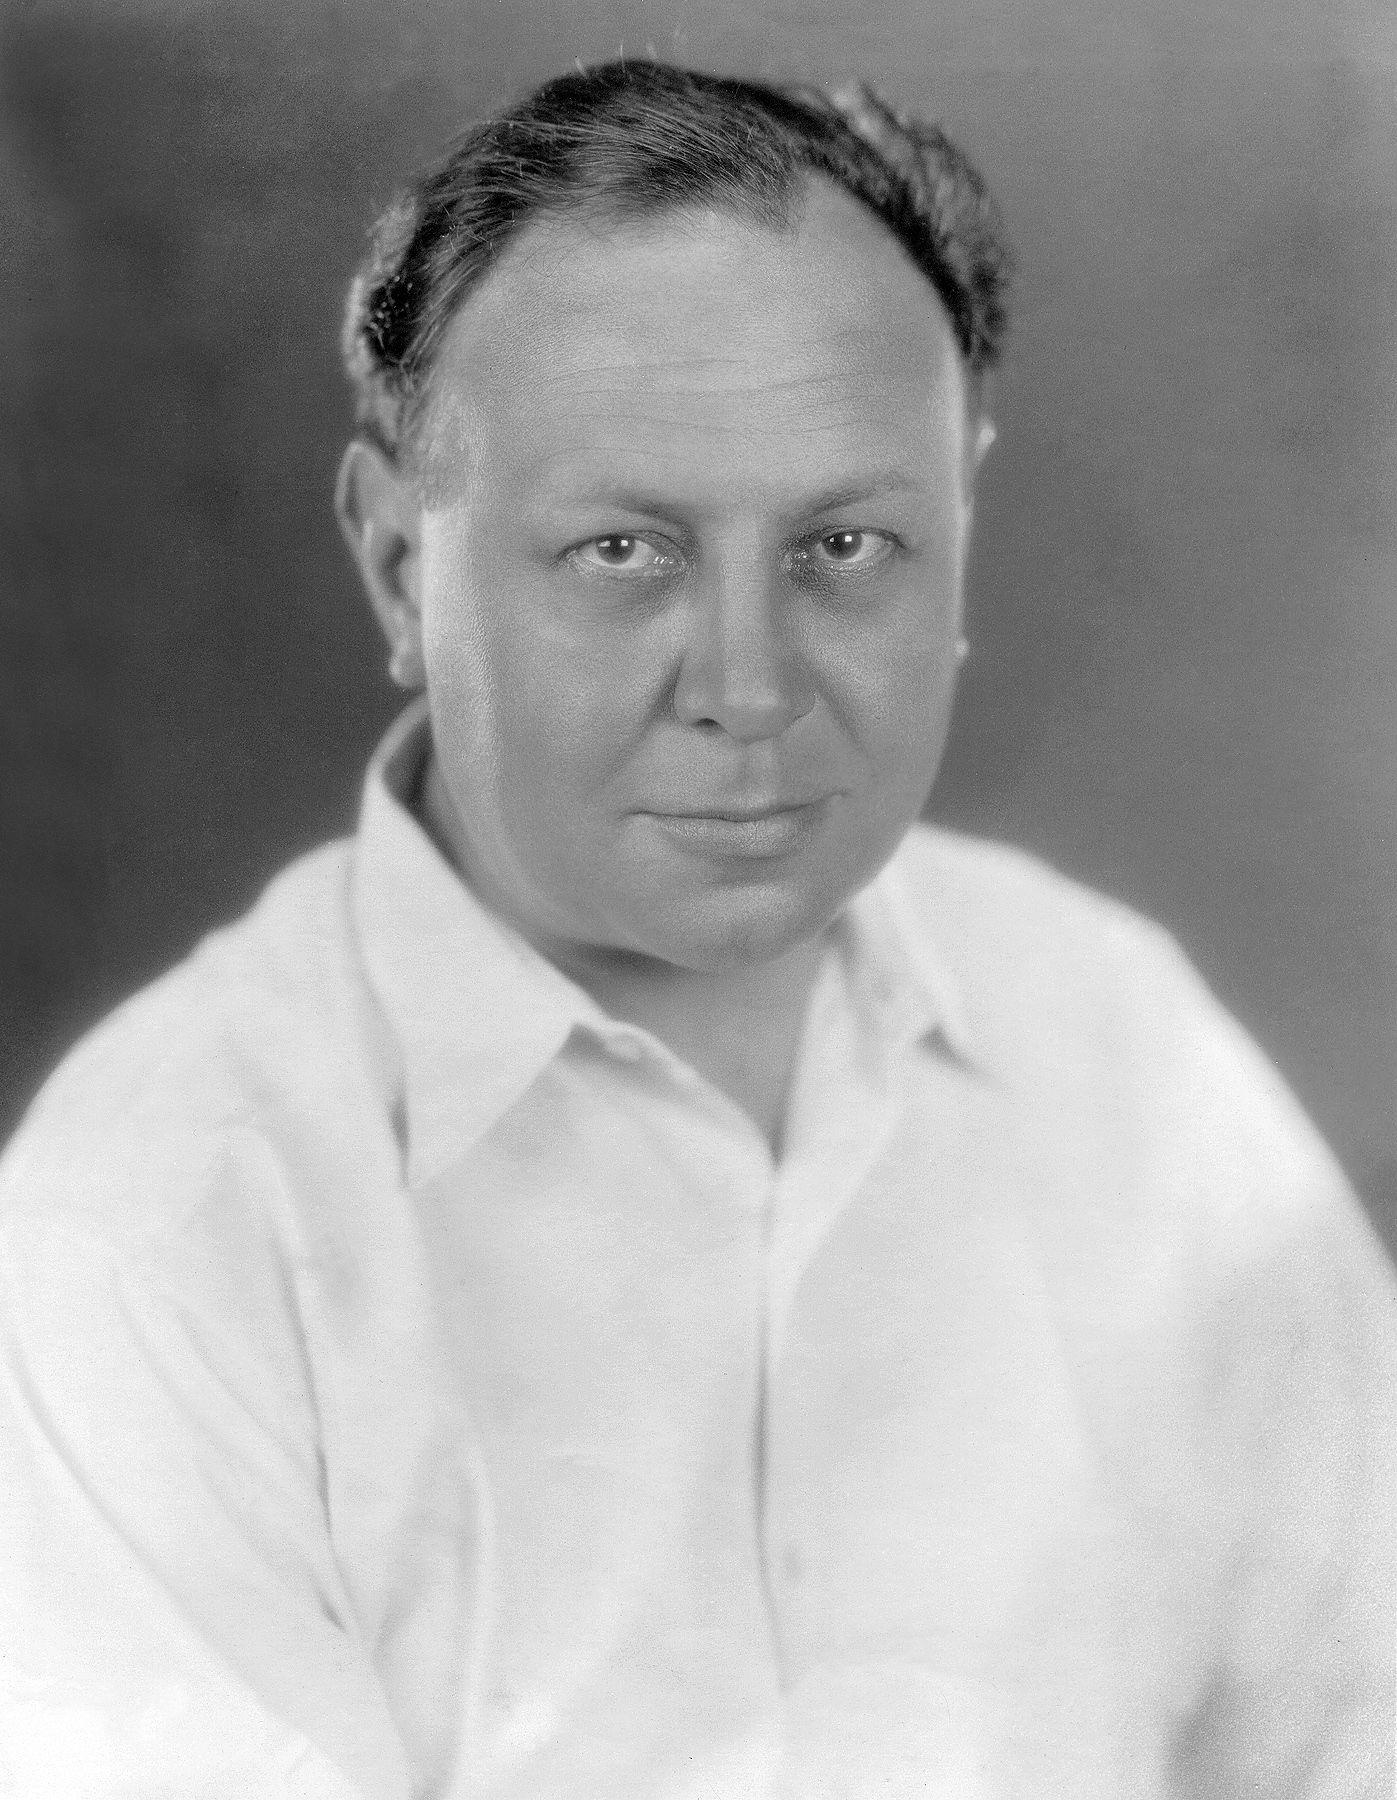 Emil jannings 18841950 theodor janenz filmstars